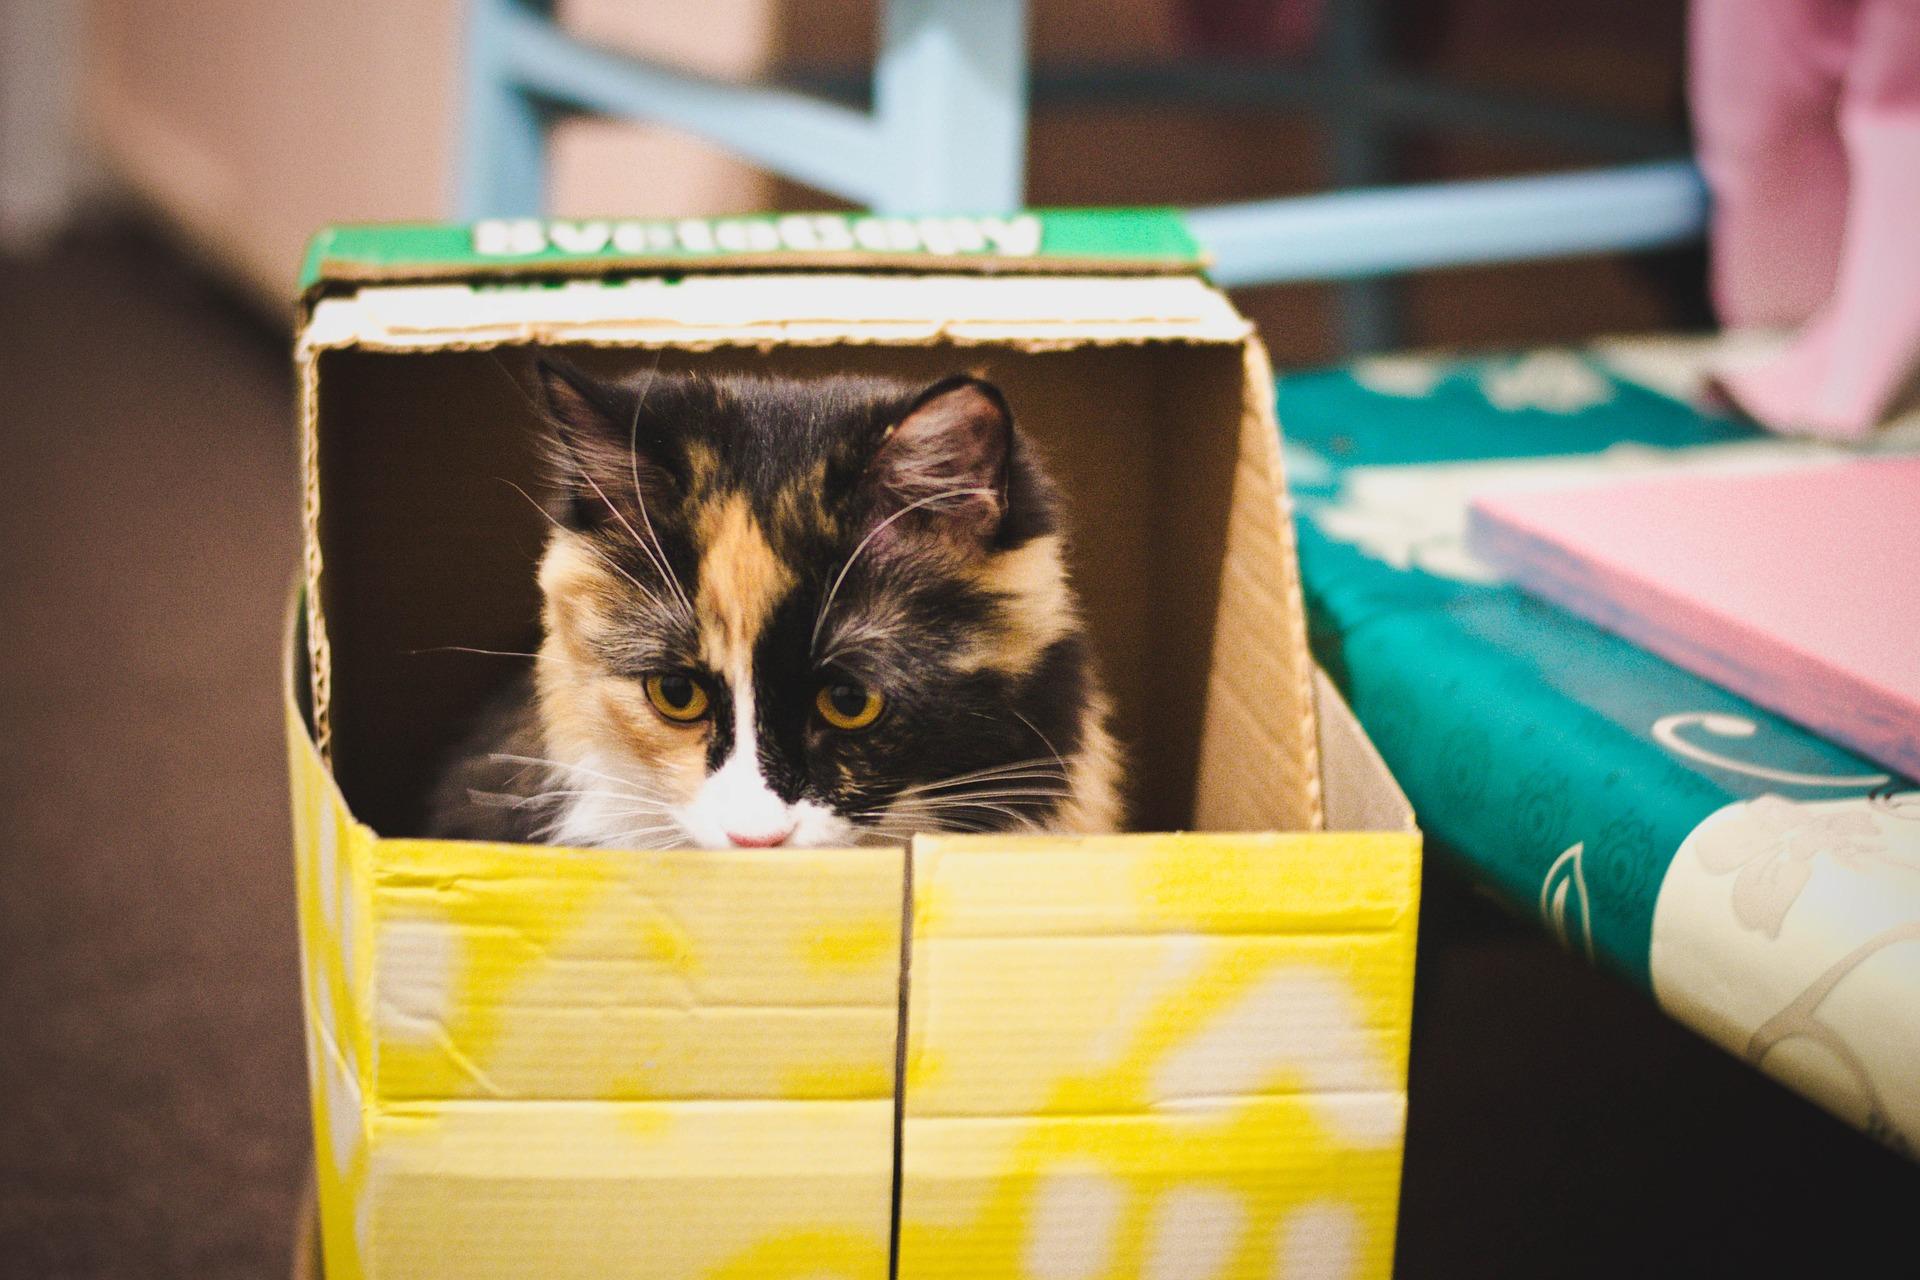 cat-650770_1920.jpg